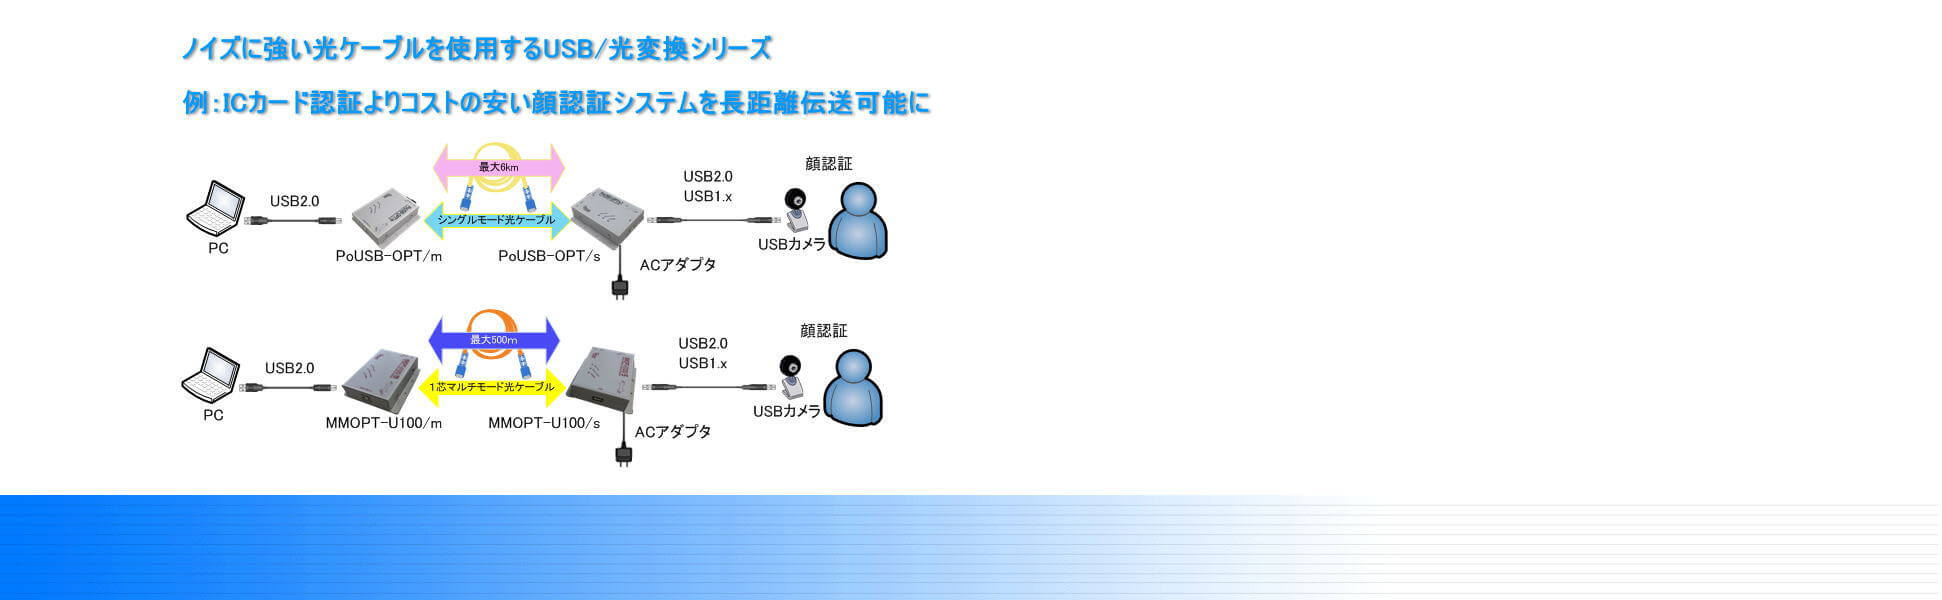 PoUSBシリーズ/MMOPTシリーズ